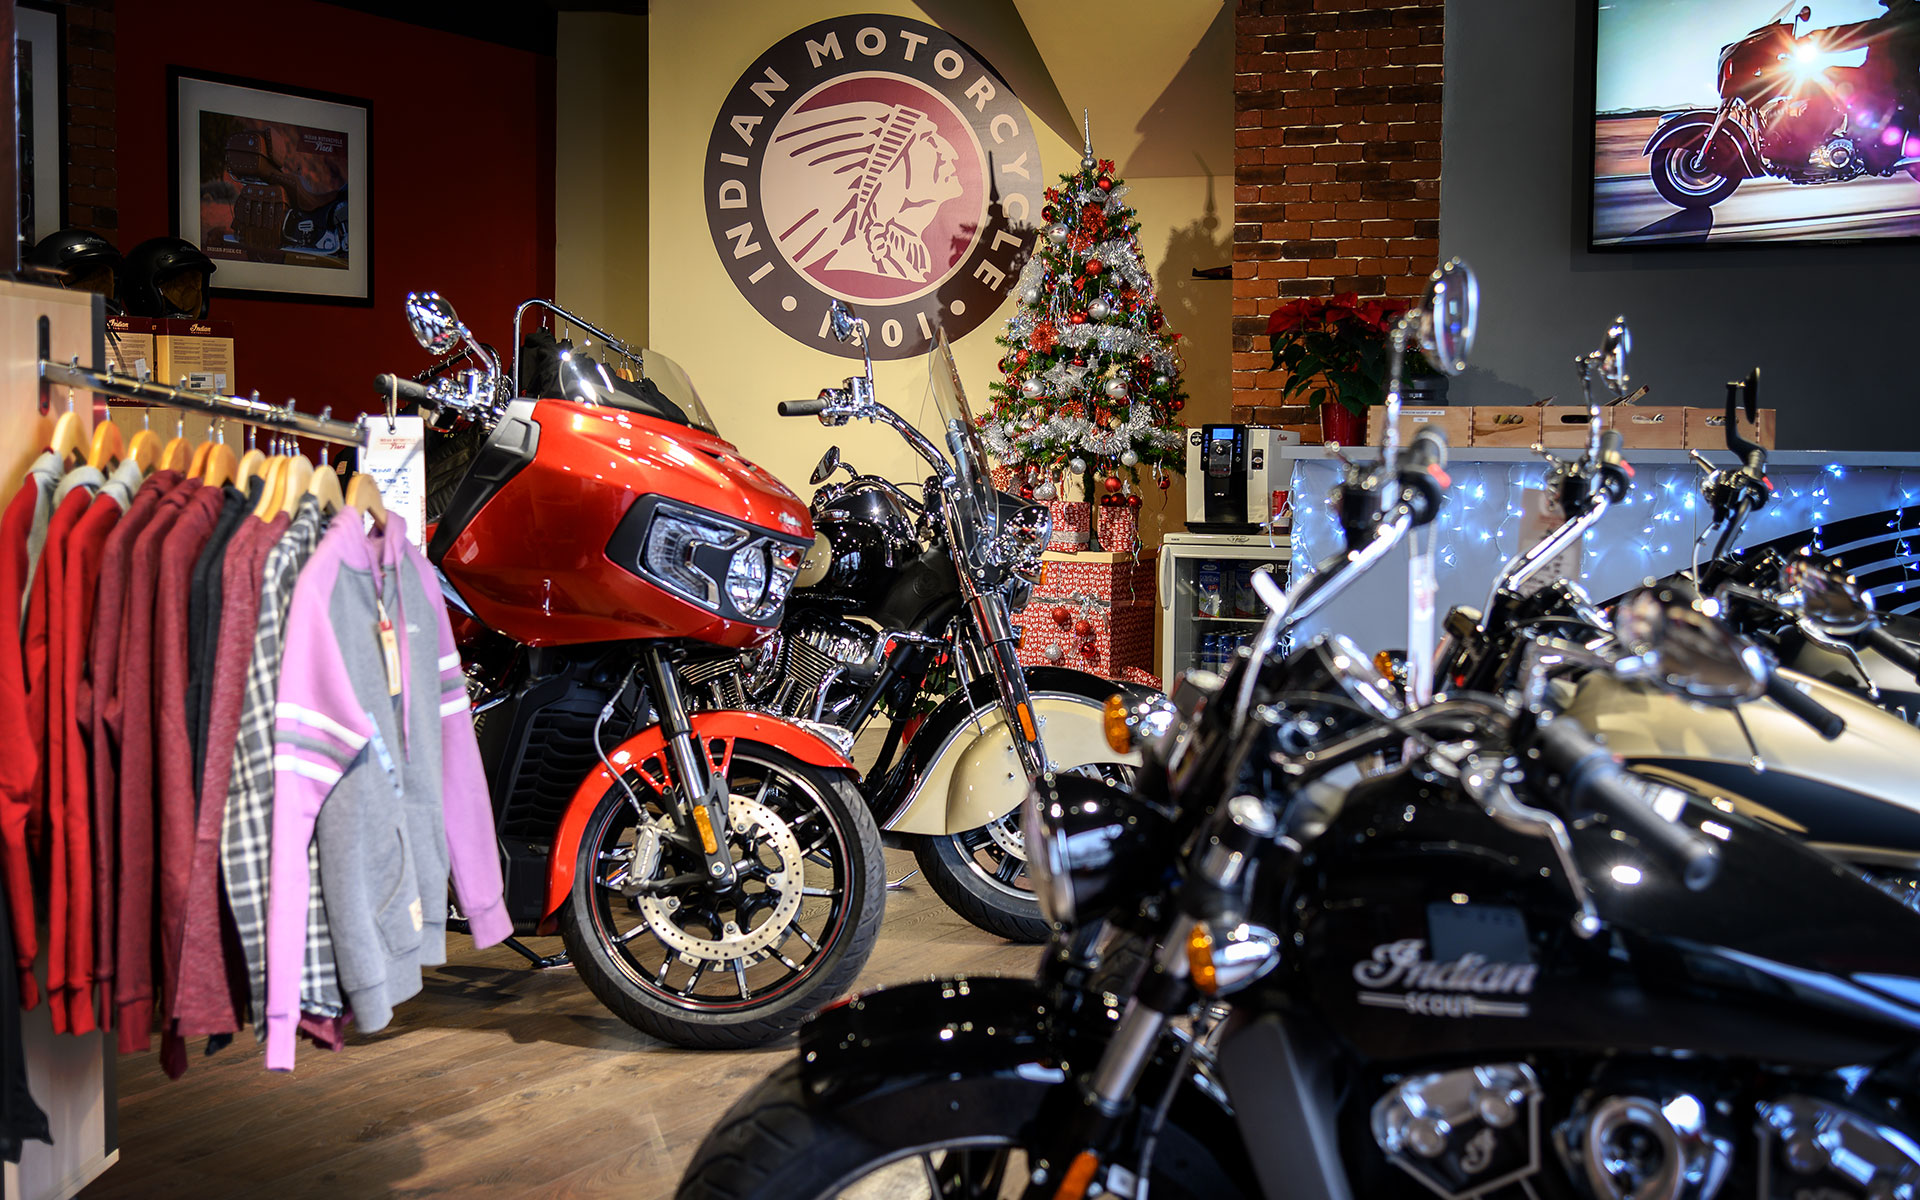 Moto Shop 2